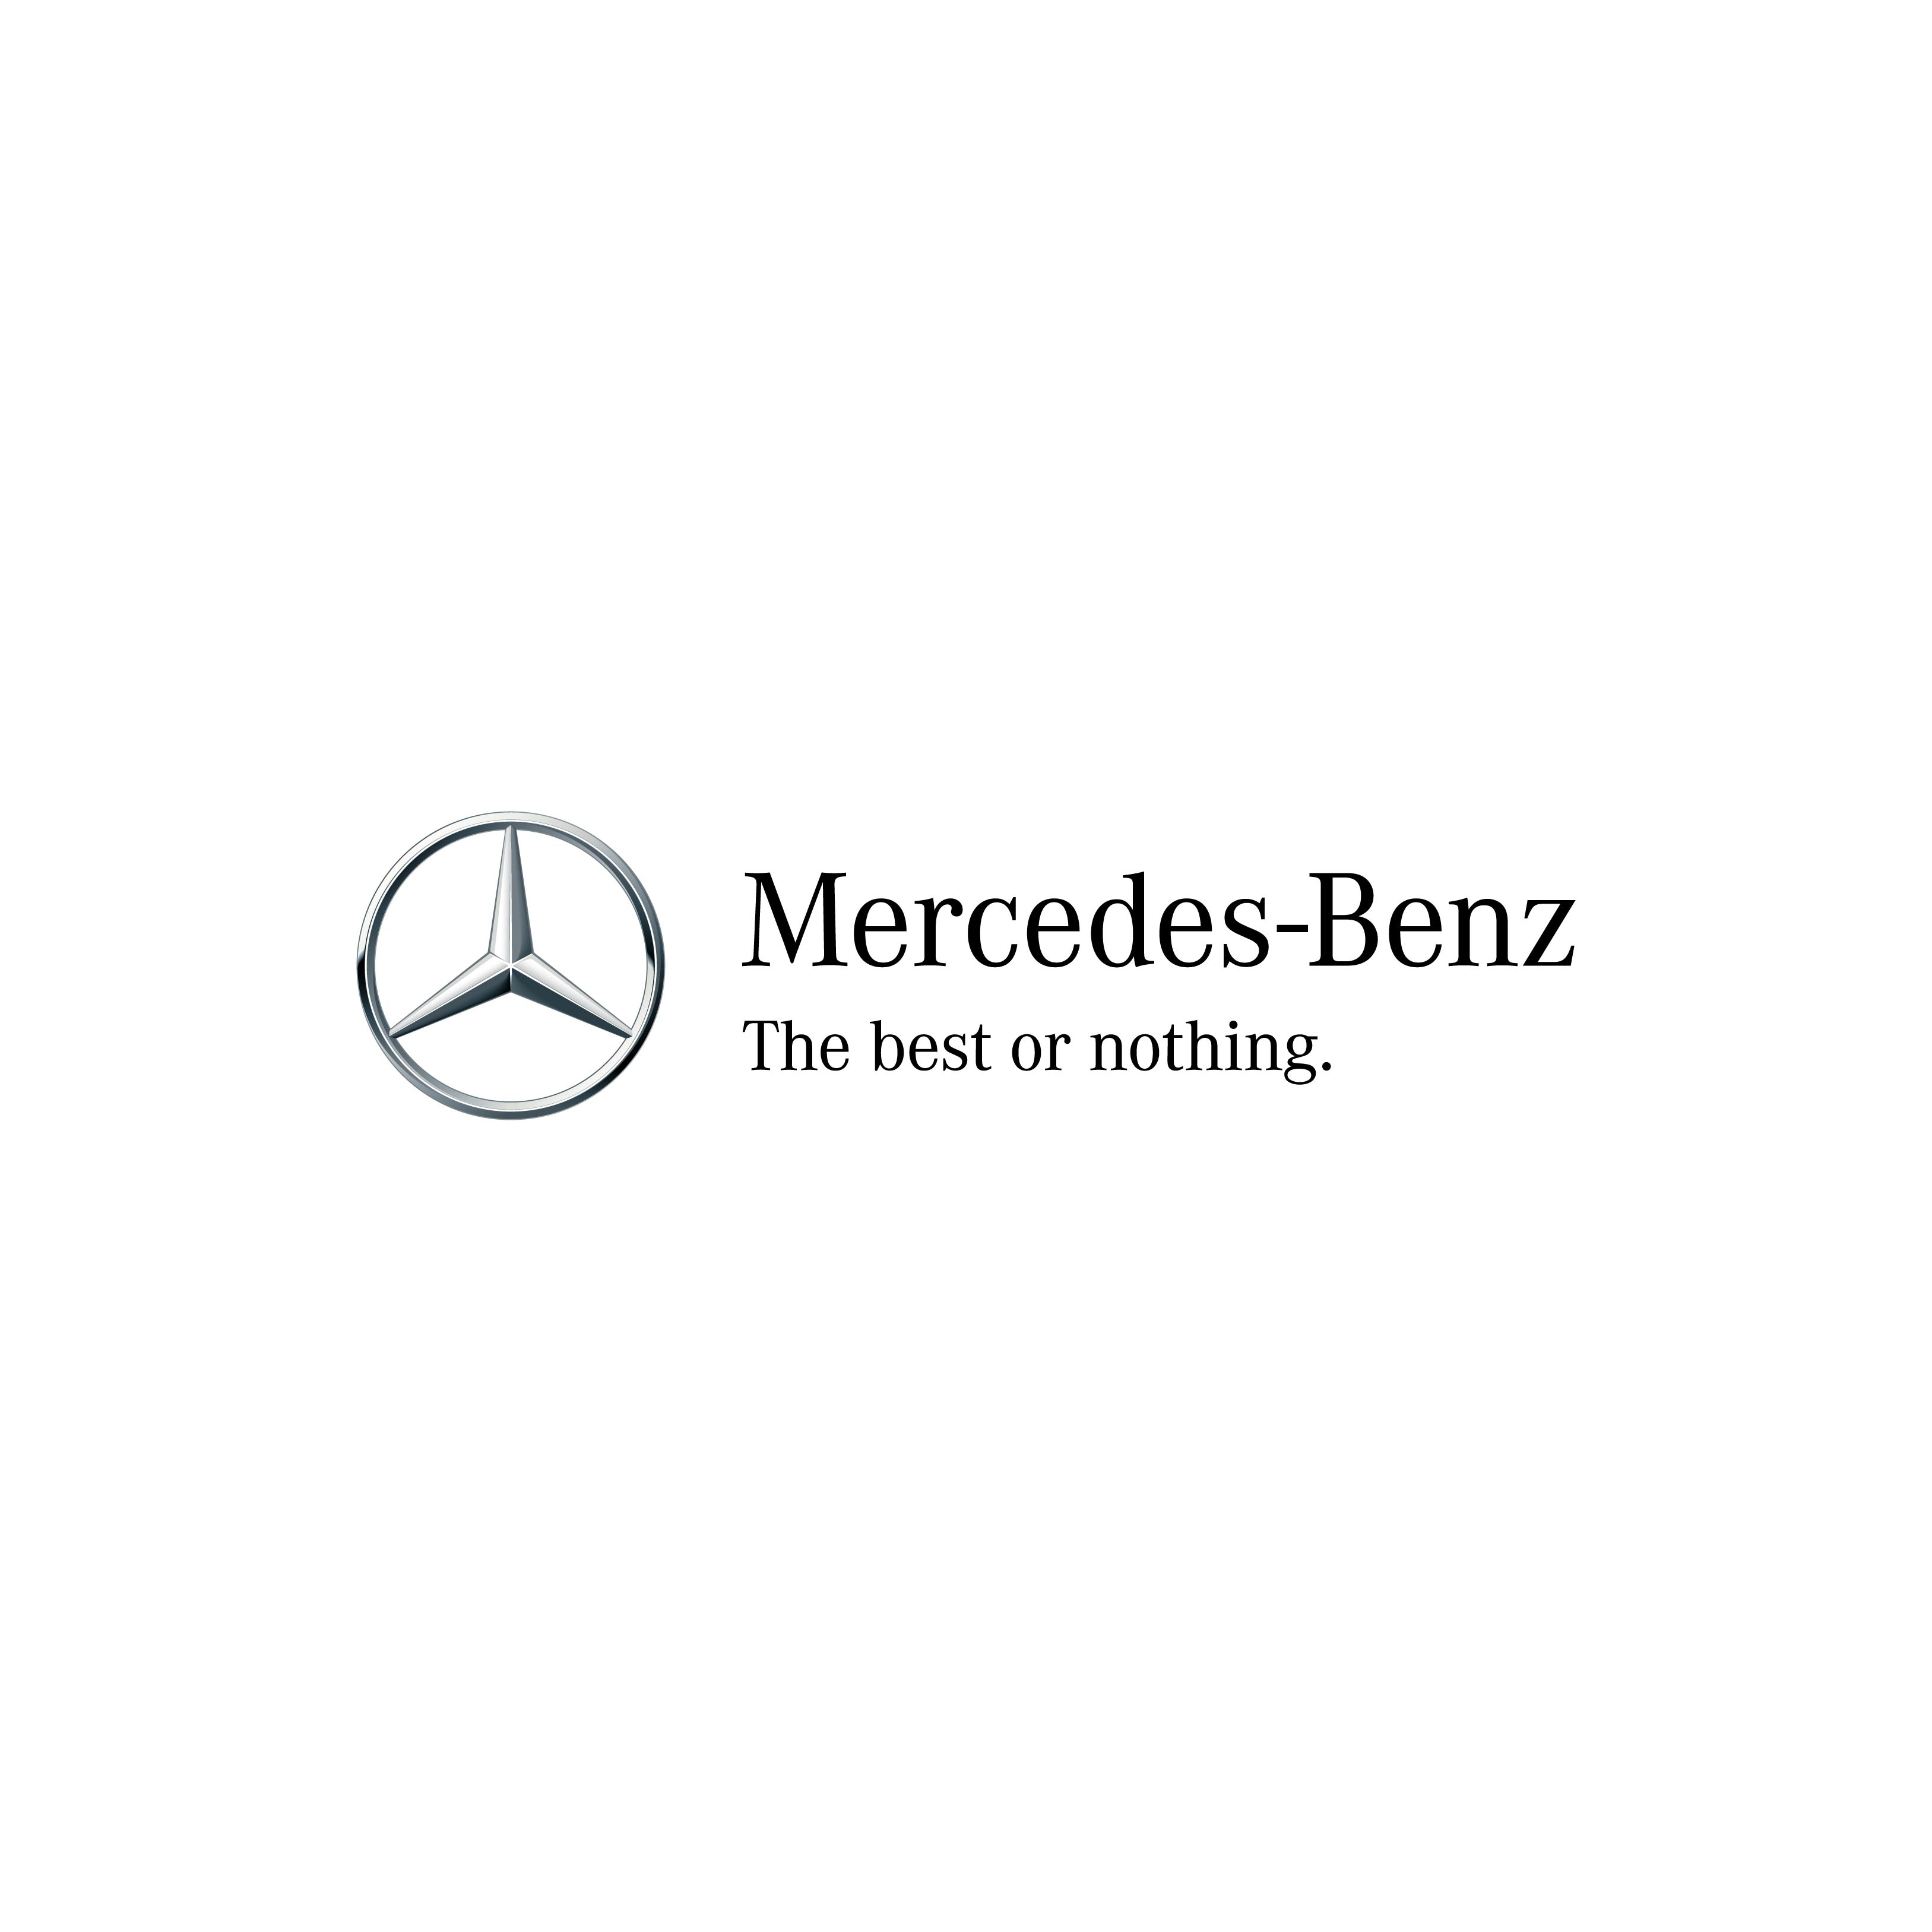 Used car dealers in portland oregon united states for Mercedes benz of portland oregon